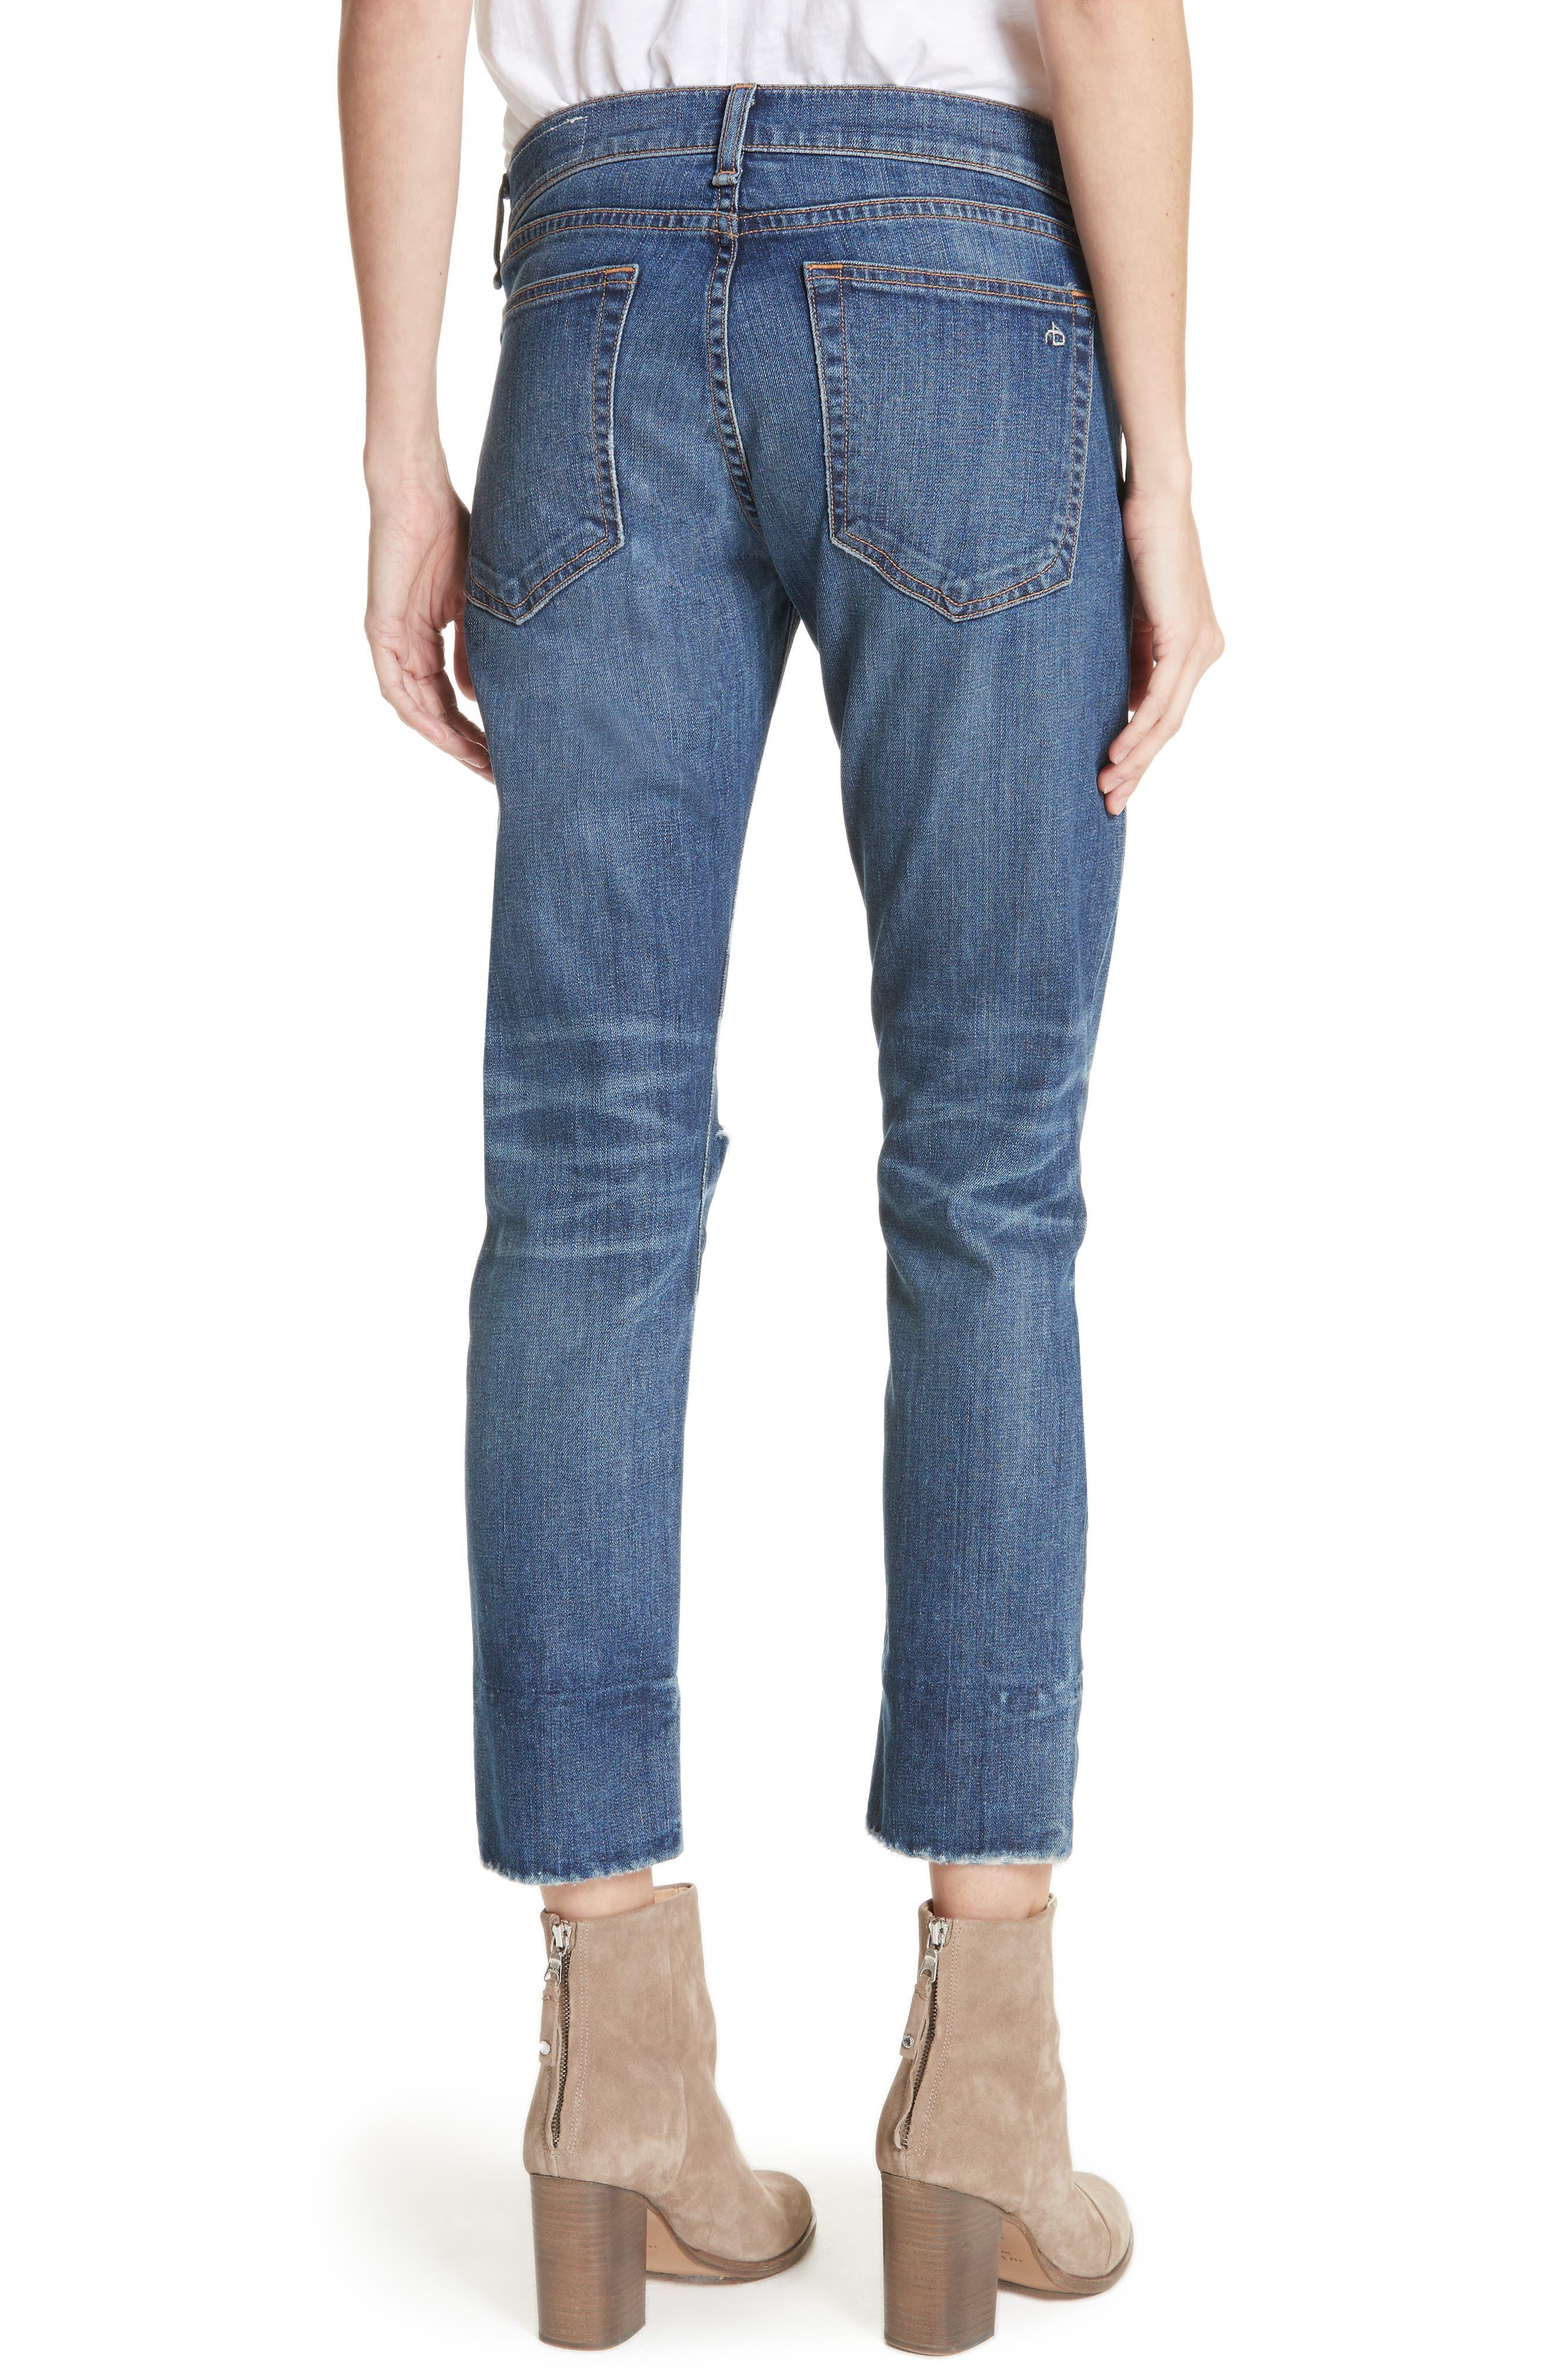 Alternate Image 2  - rag & bone/JEAN Dre Ankle Slim Boyfriend Jeans (Deville)